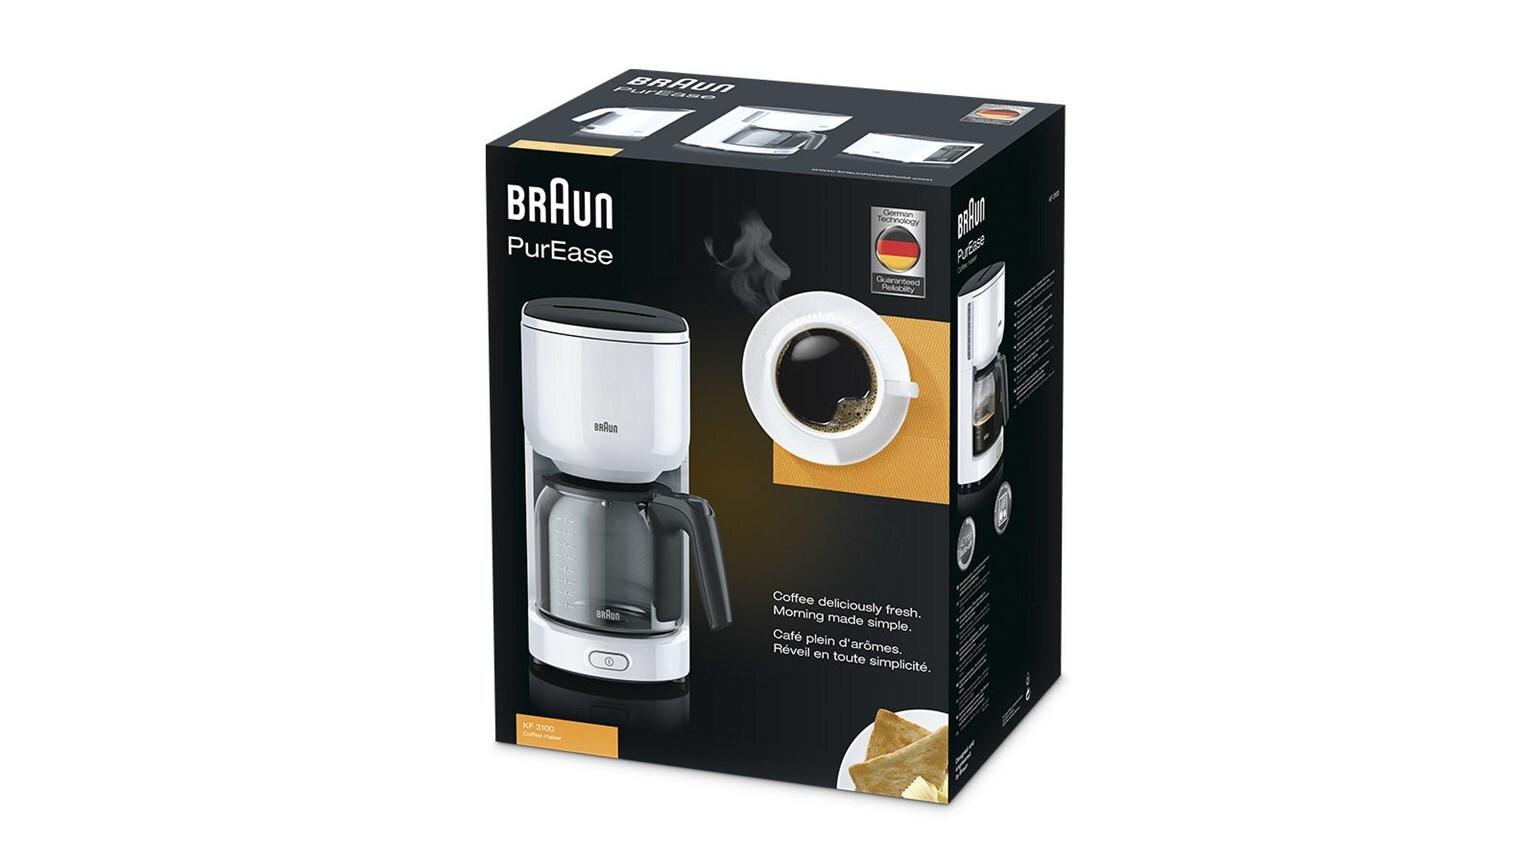 Braun PurEase Coffee Maker KF 3100 WH 4